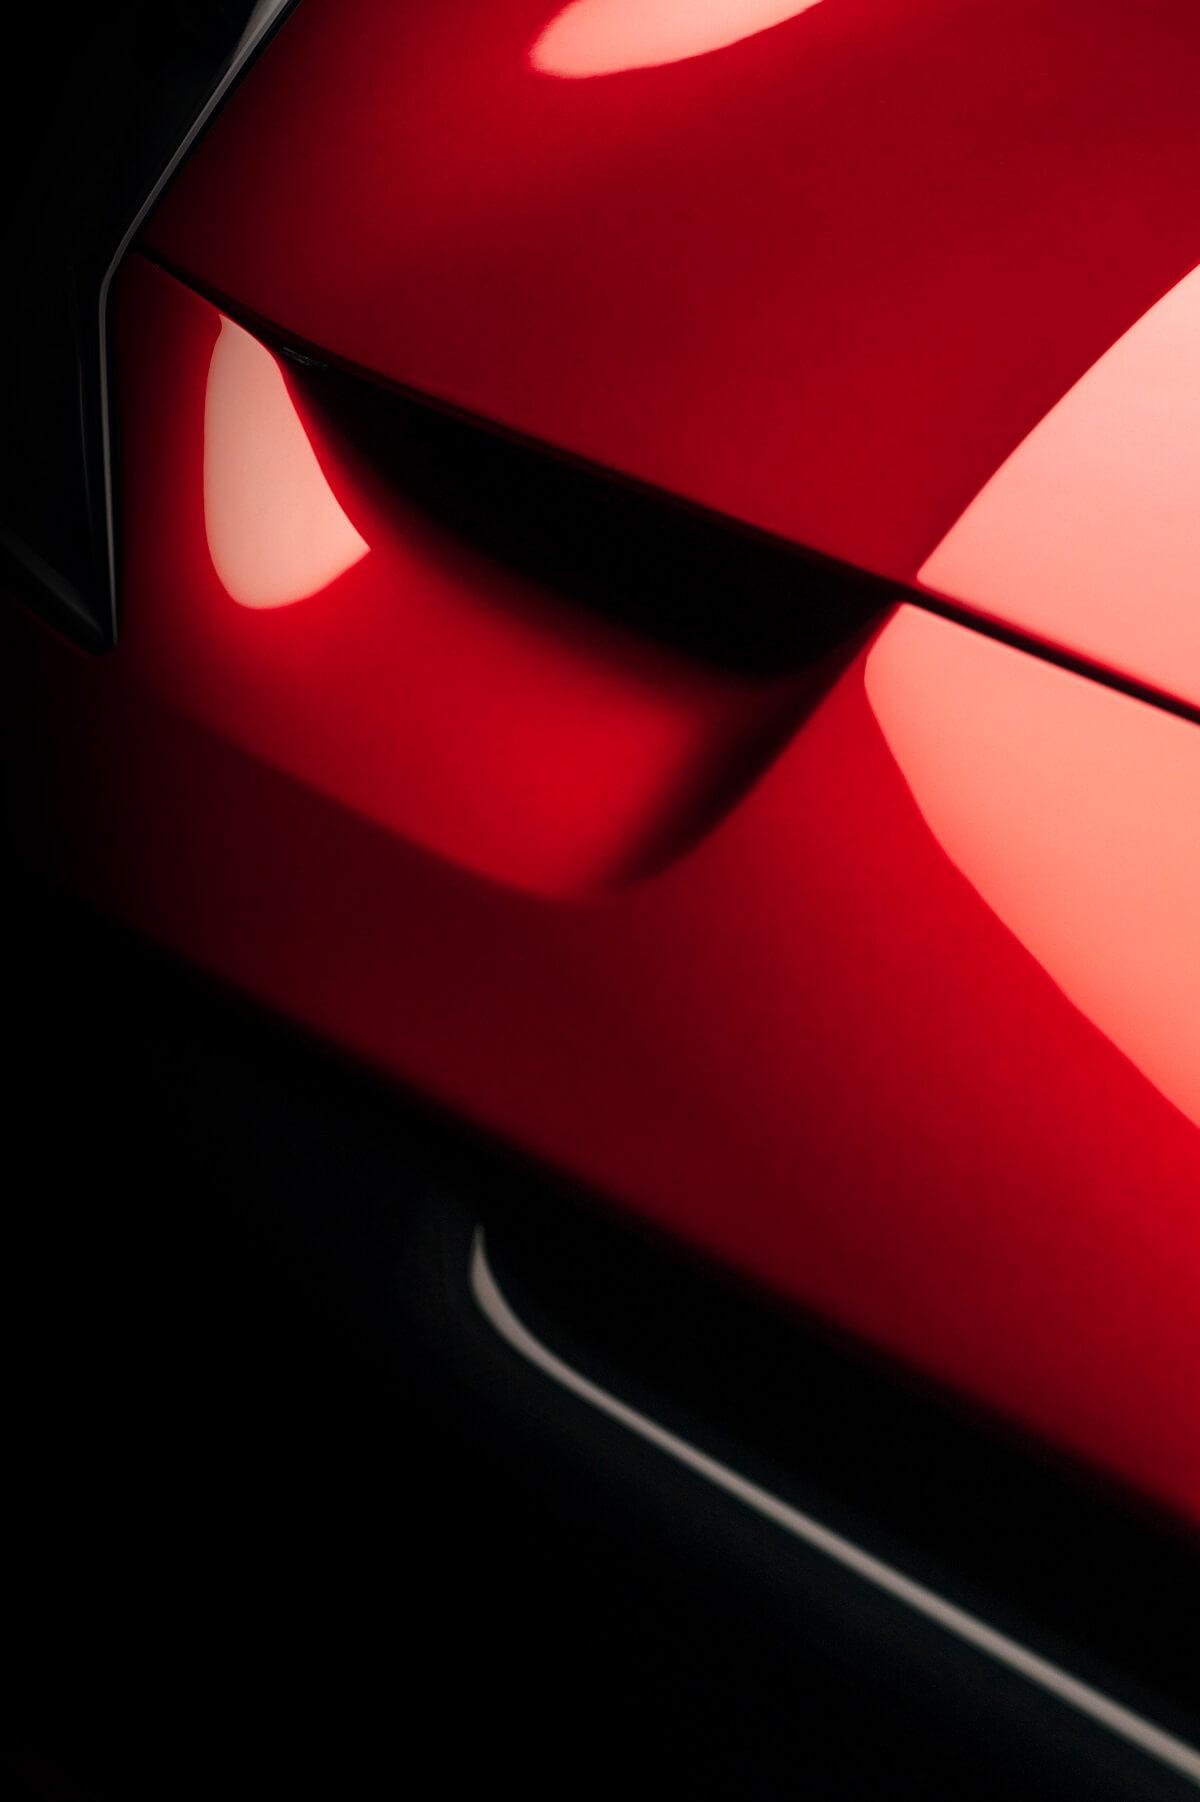 08_Ferrari_Omologata_f_intake_detail.jpg